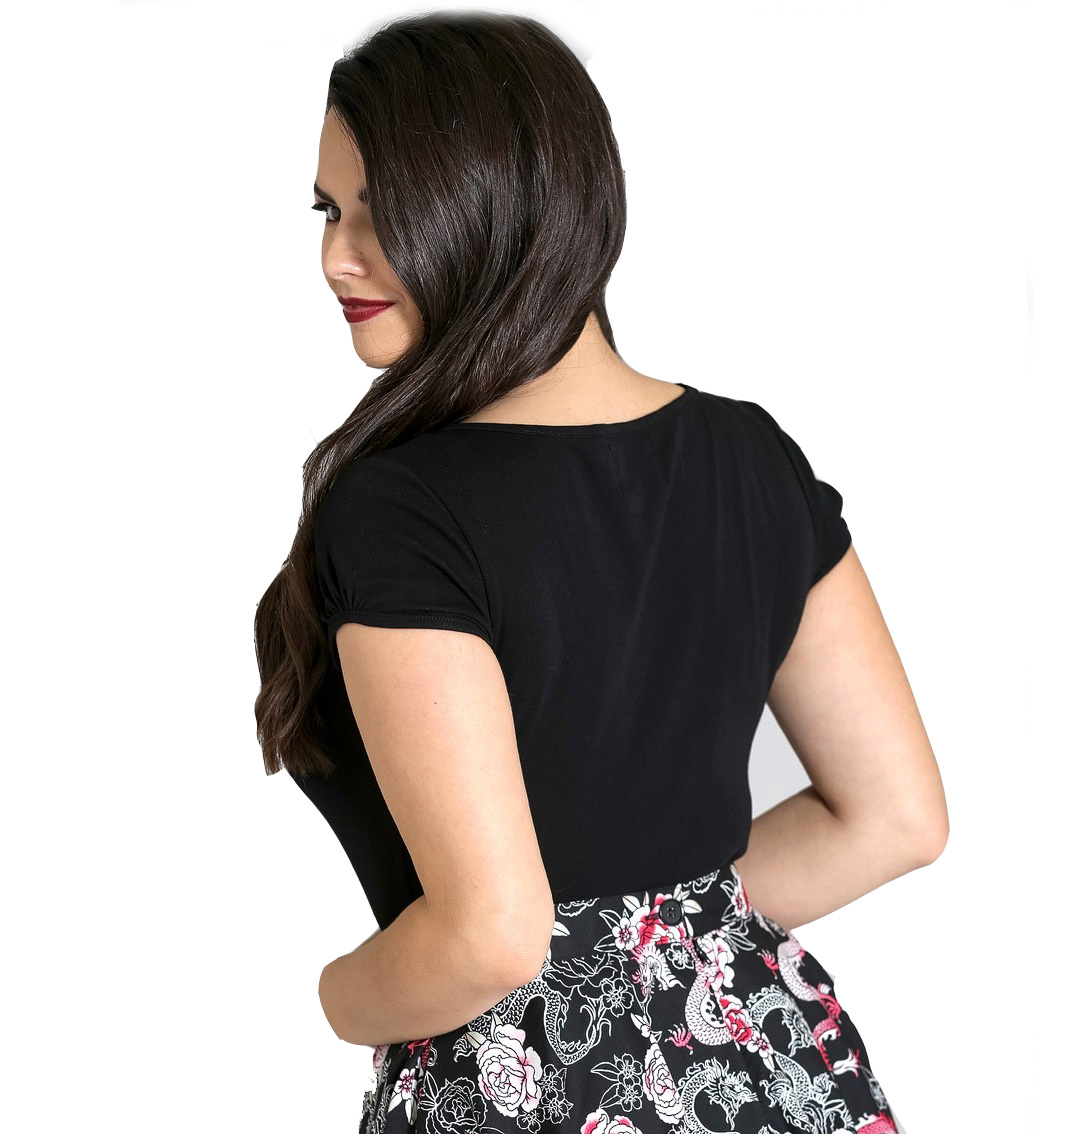 Hell-Bunny-Shirt-50s-Rockabilly-Top-MIA-Plain-Black-Short-Sleeves-All-Sizes thumbnail 29